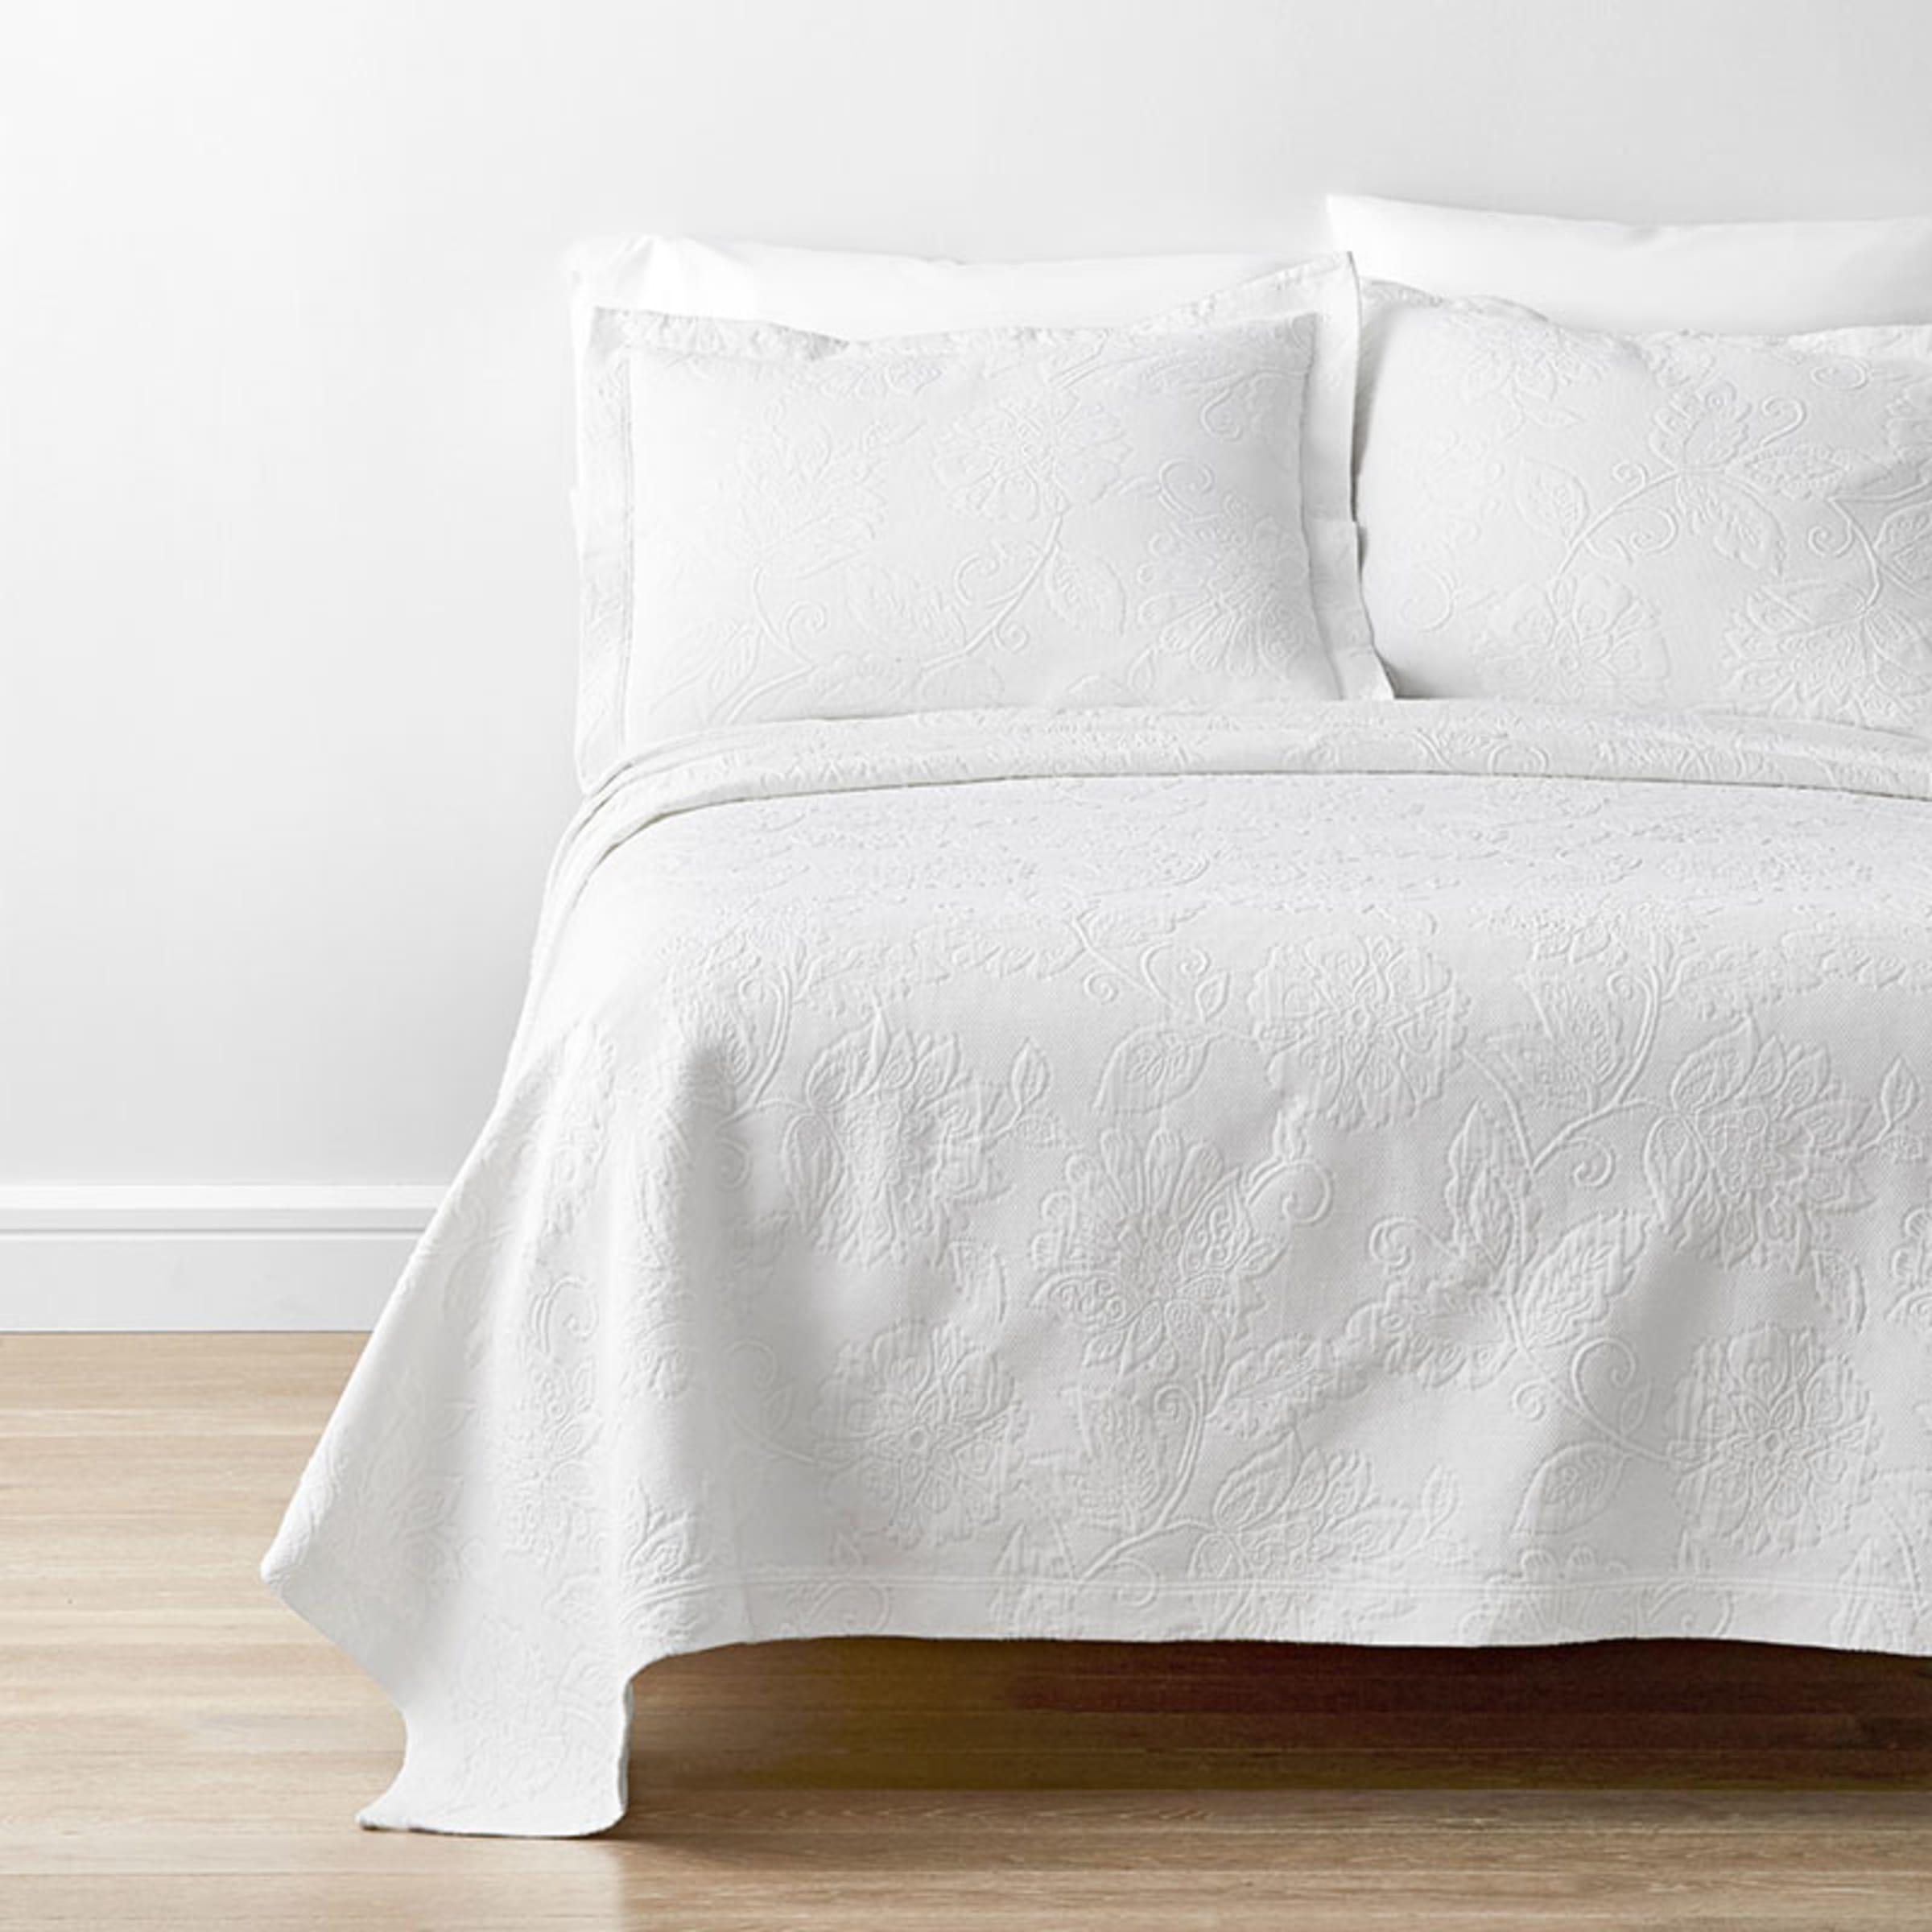 Putnam Cotton Matelasse Coverlet